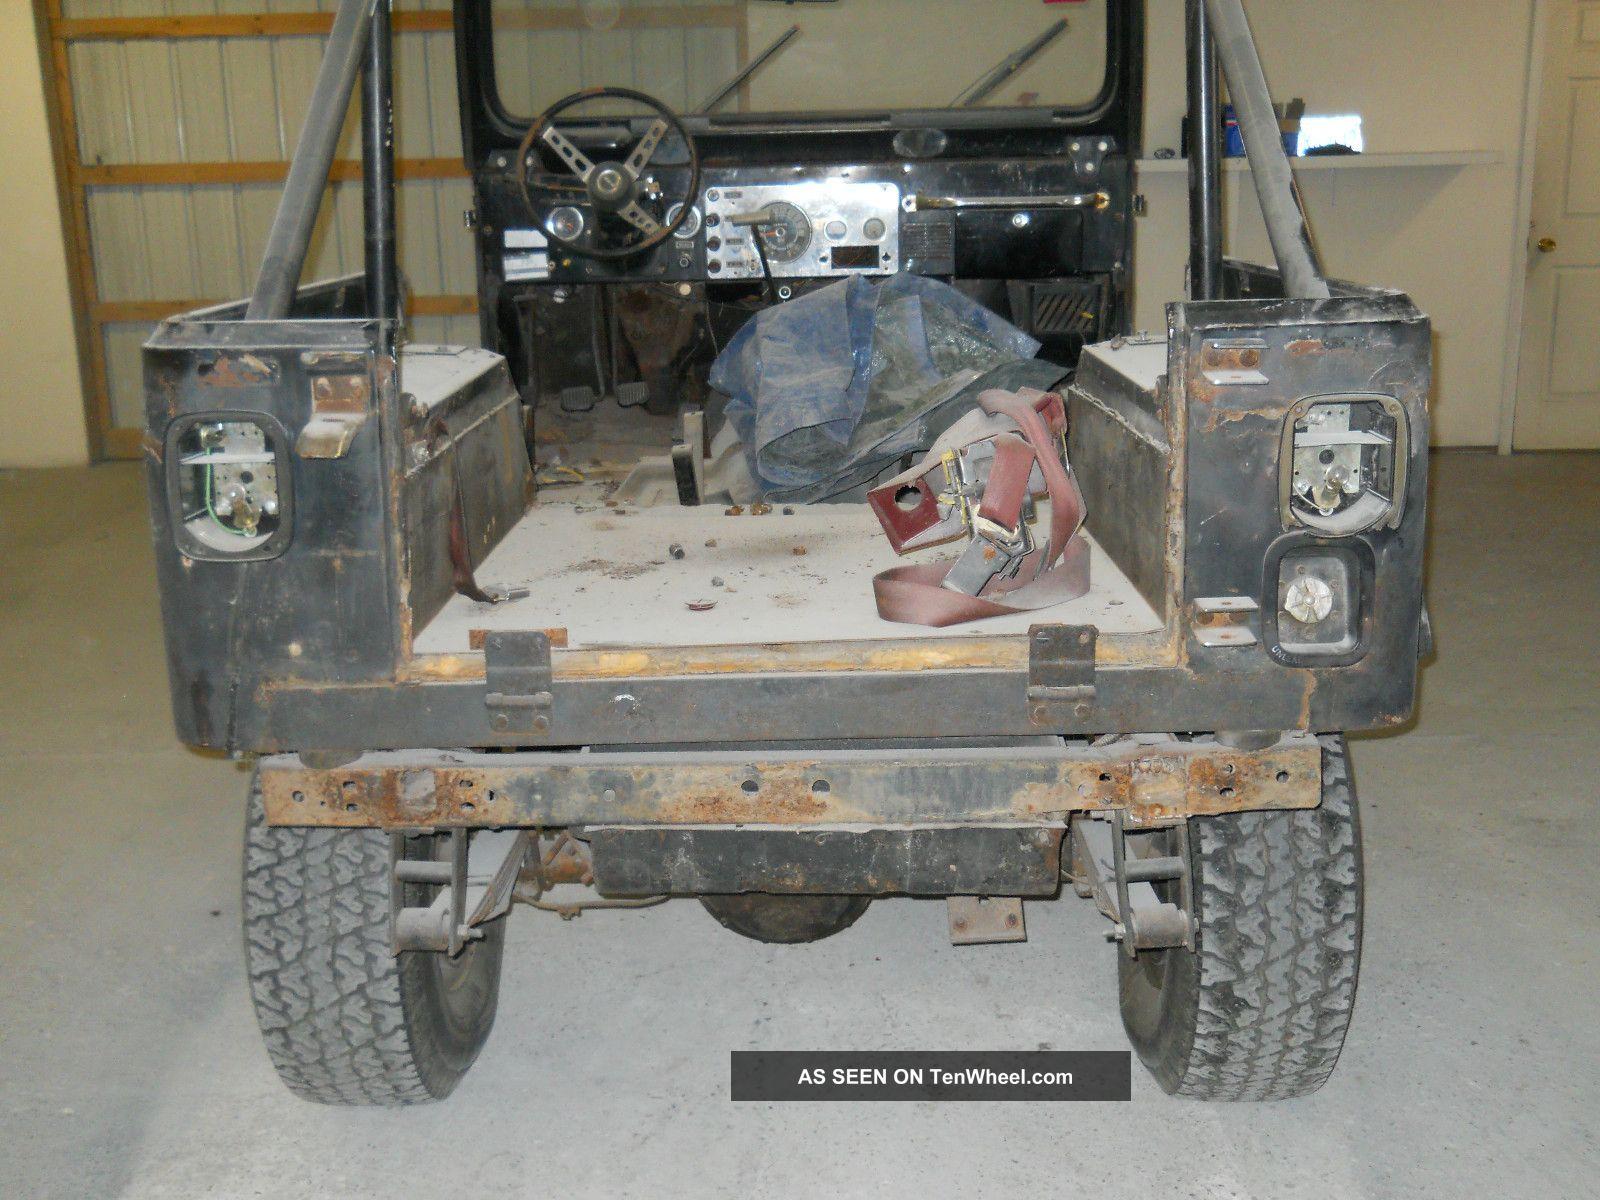 1978 Jeep Cj7 Rebuilt Motor With Receipts Good Driveline